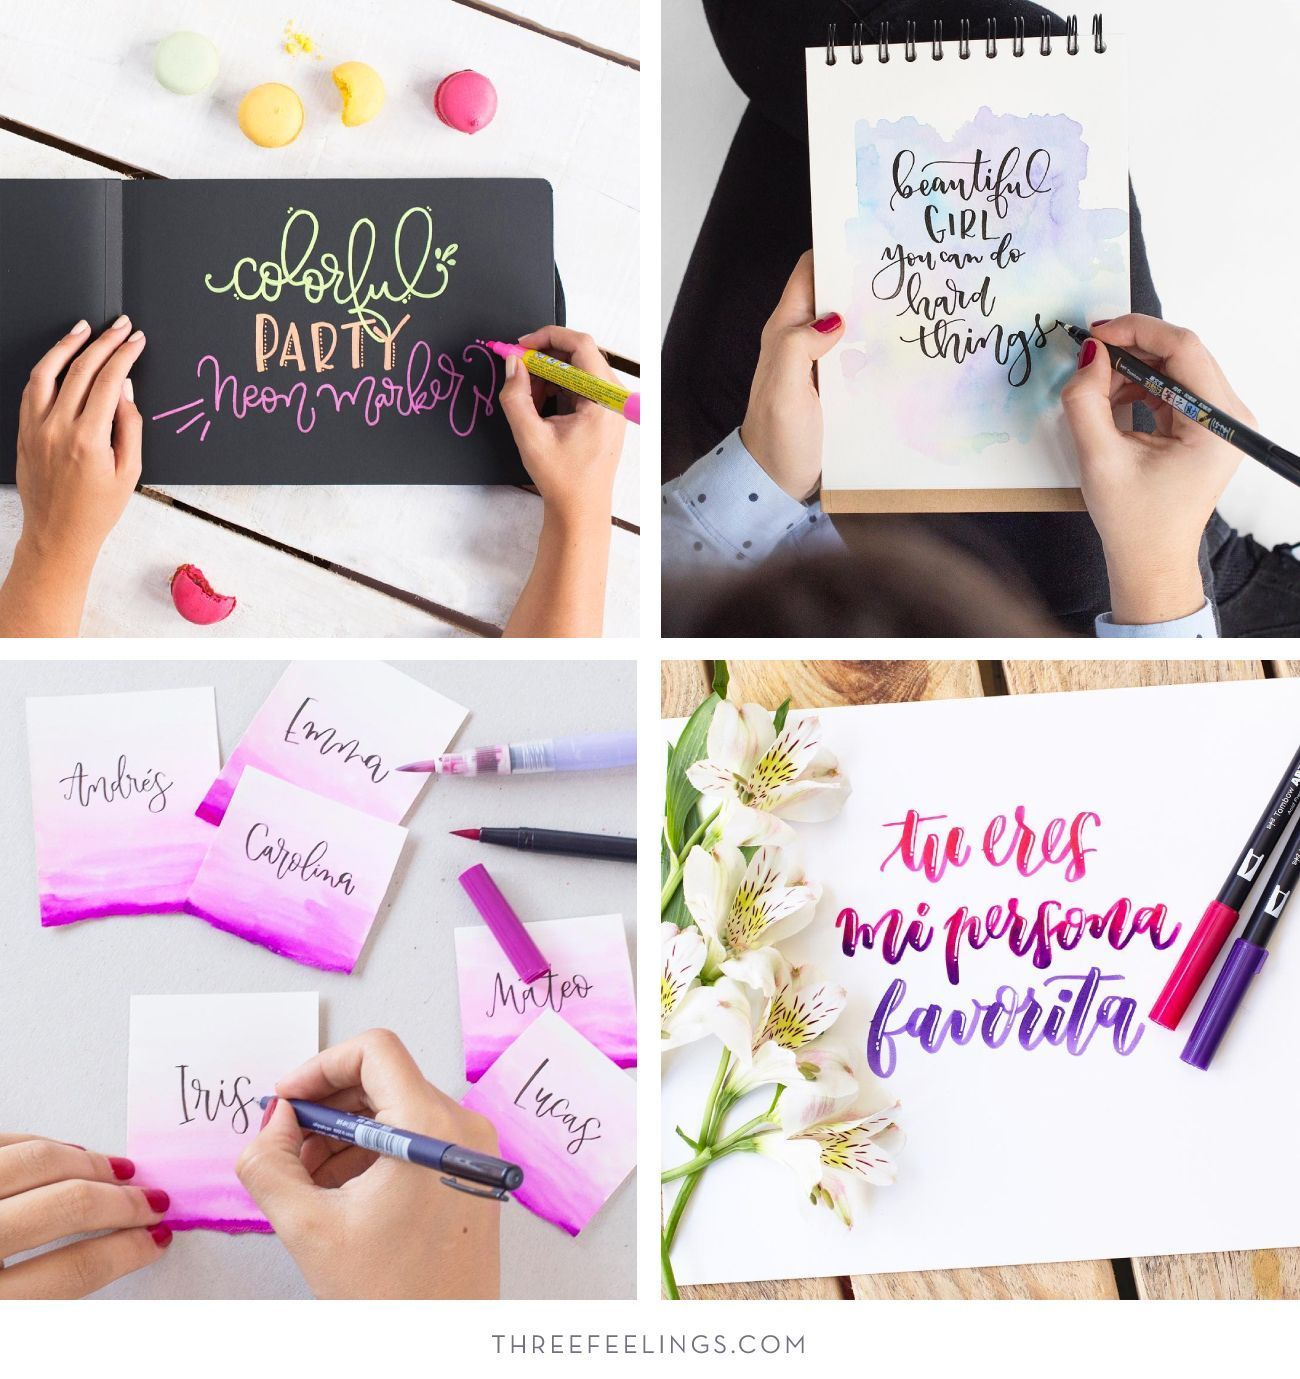 diferencia-caligrafia-lettering-tipografia-threefeelings-05